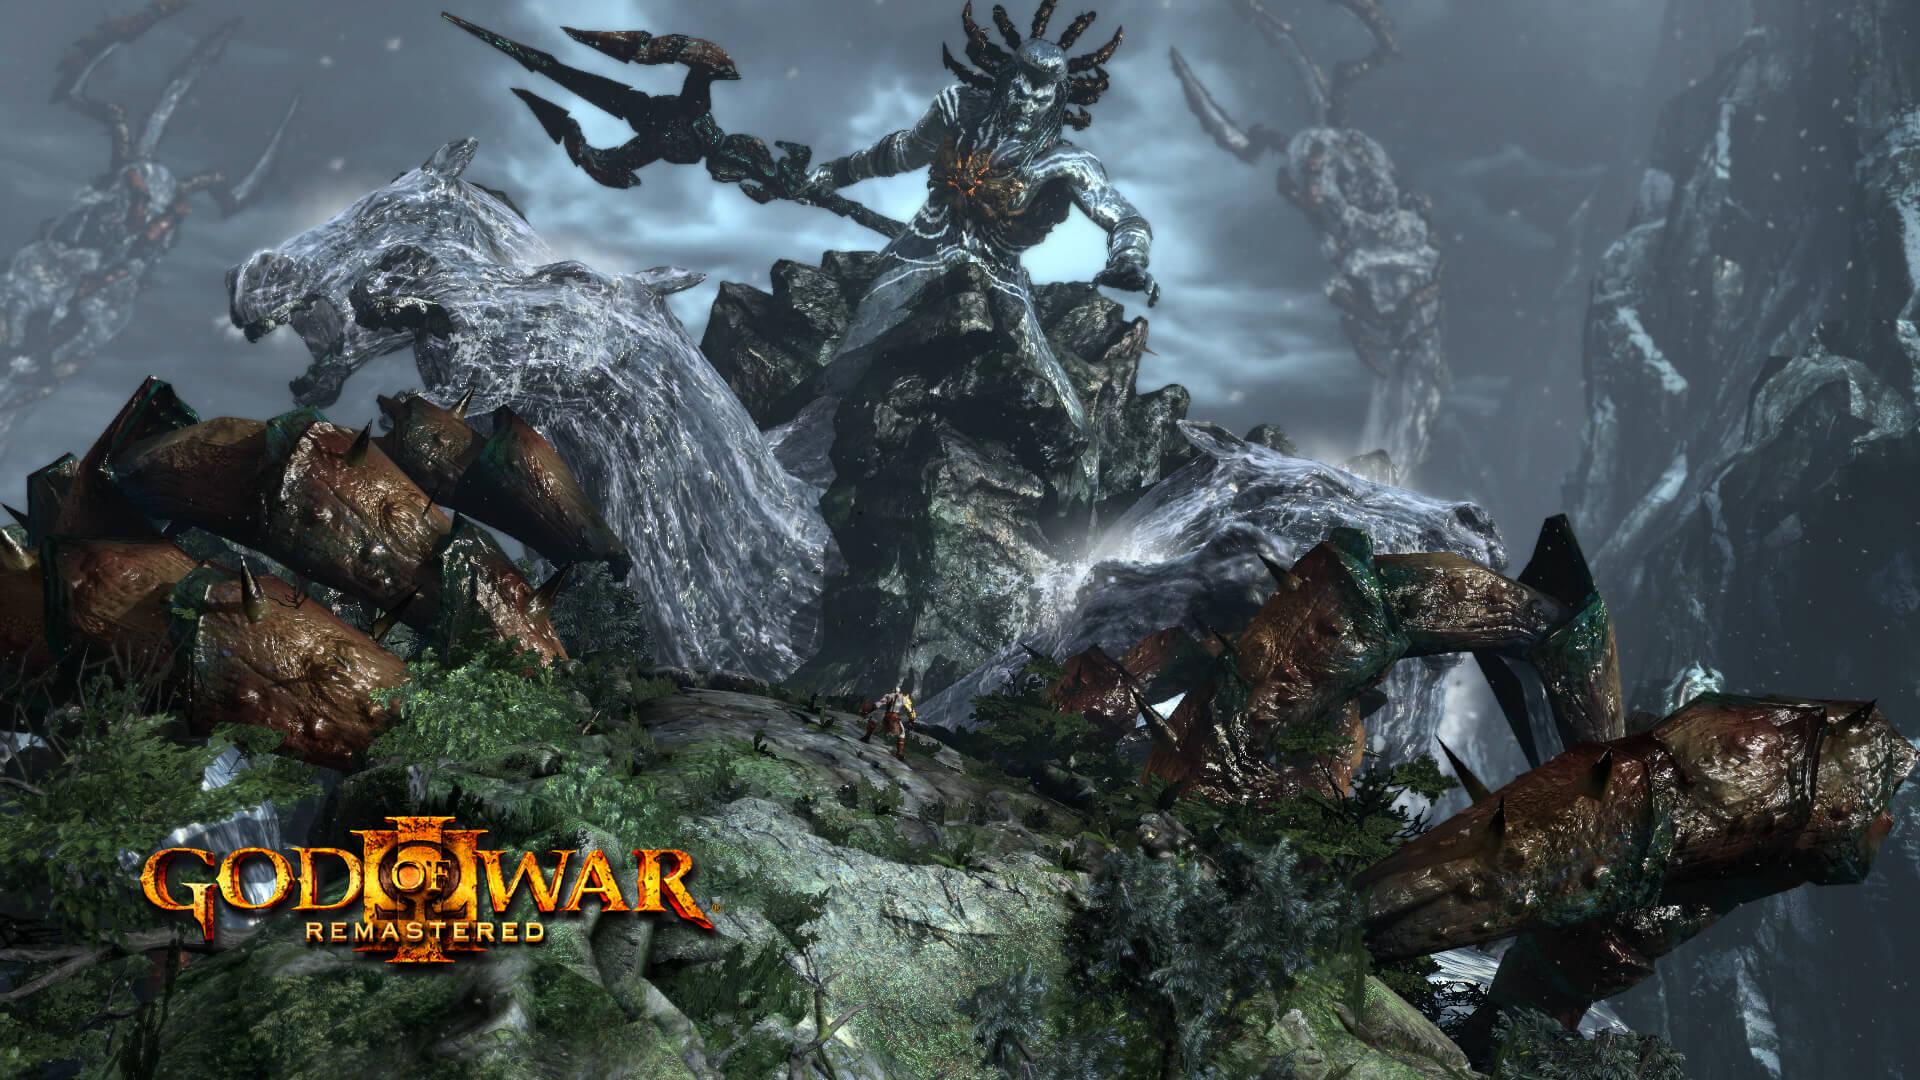 game ps3 terbaik 2020 god of war 3